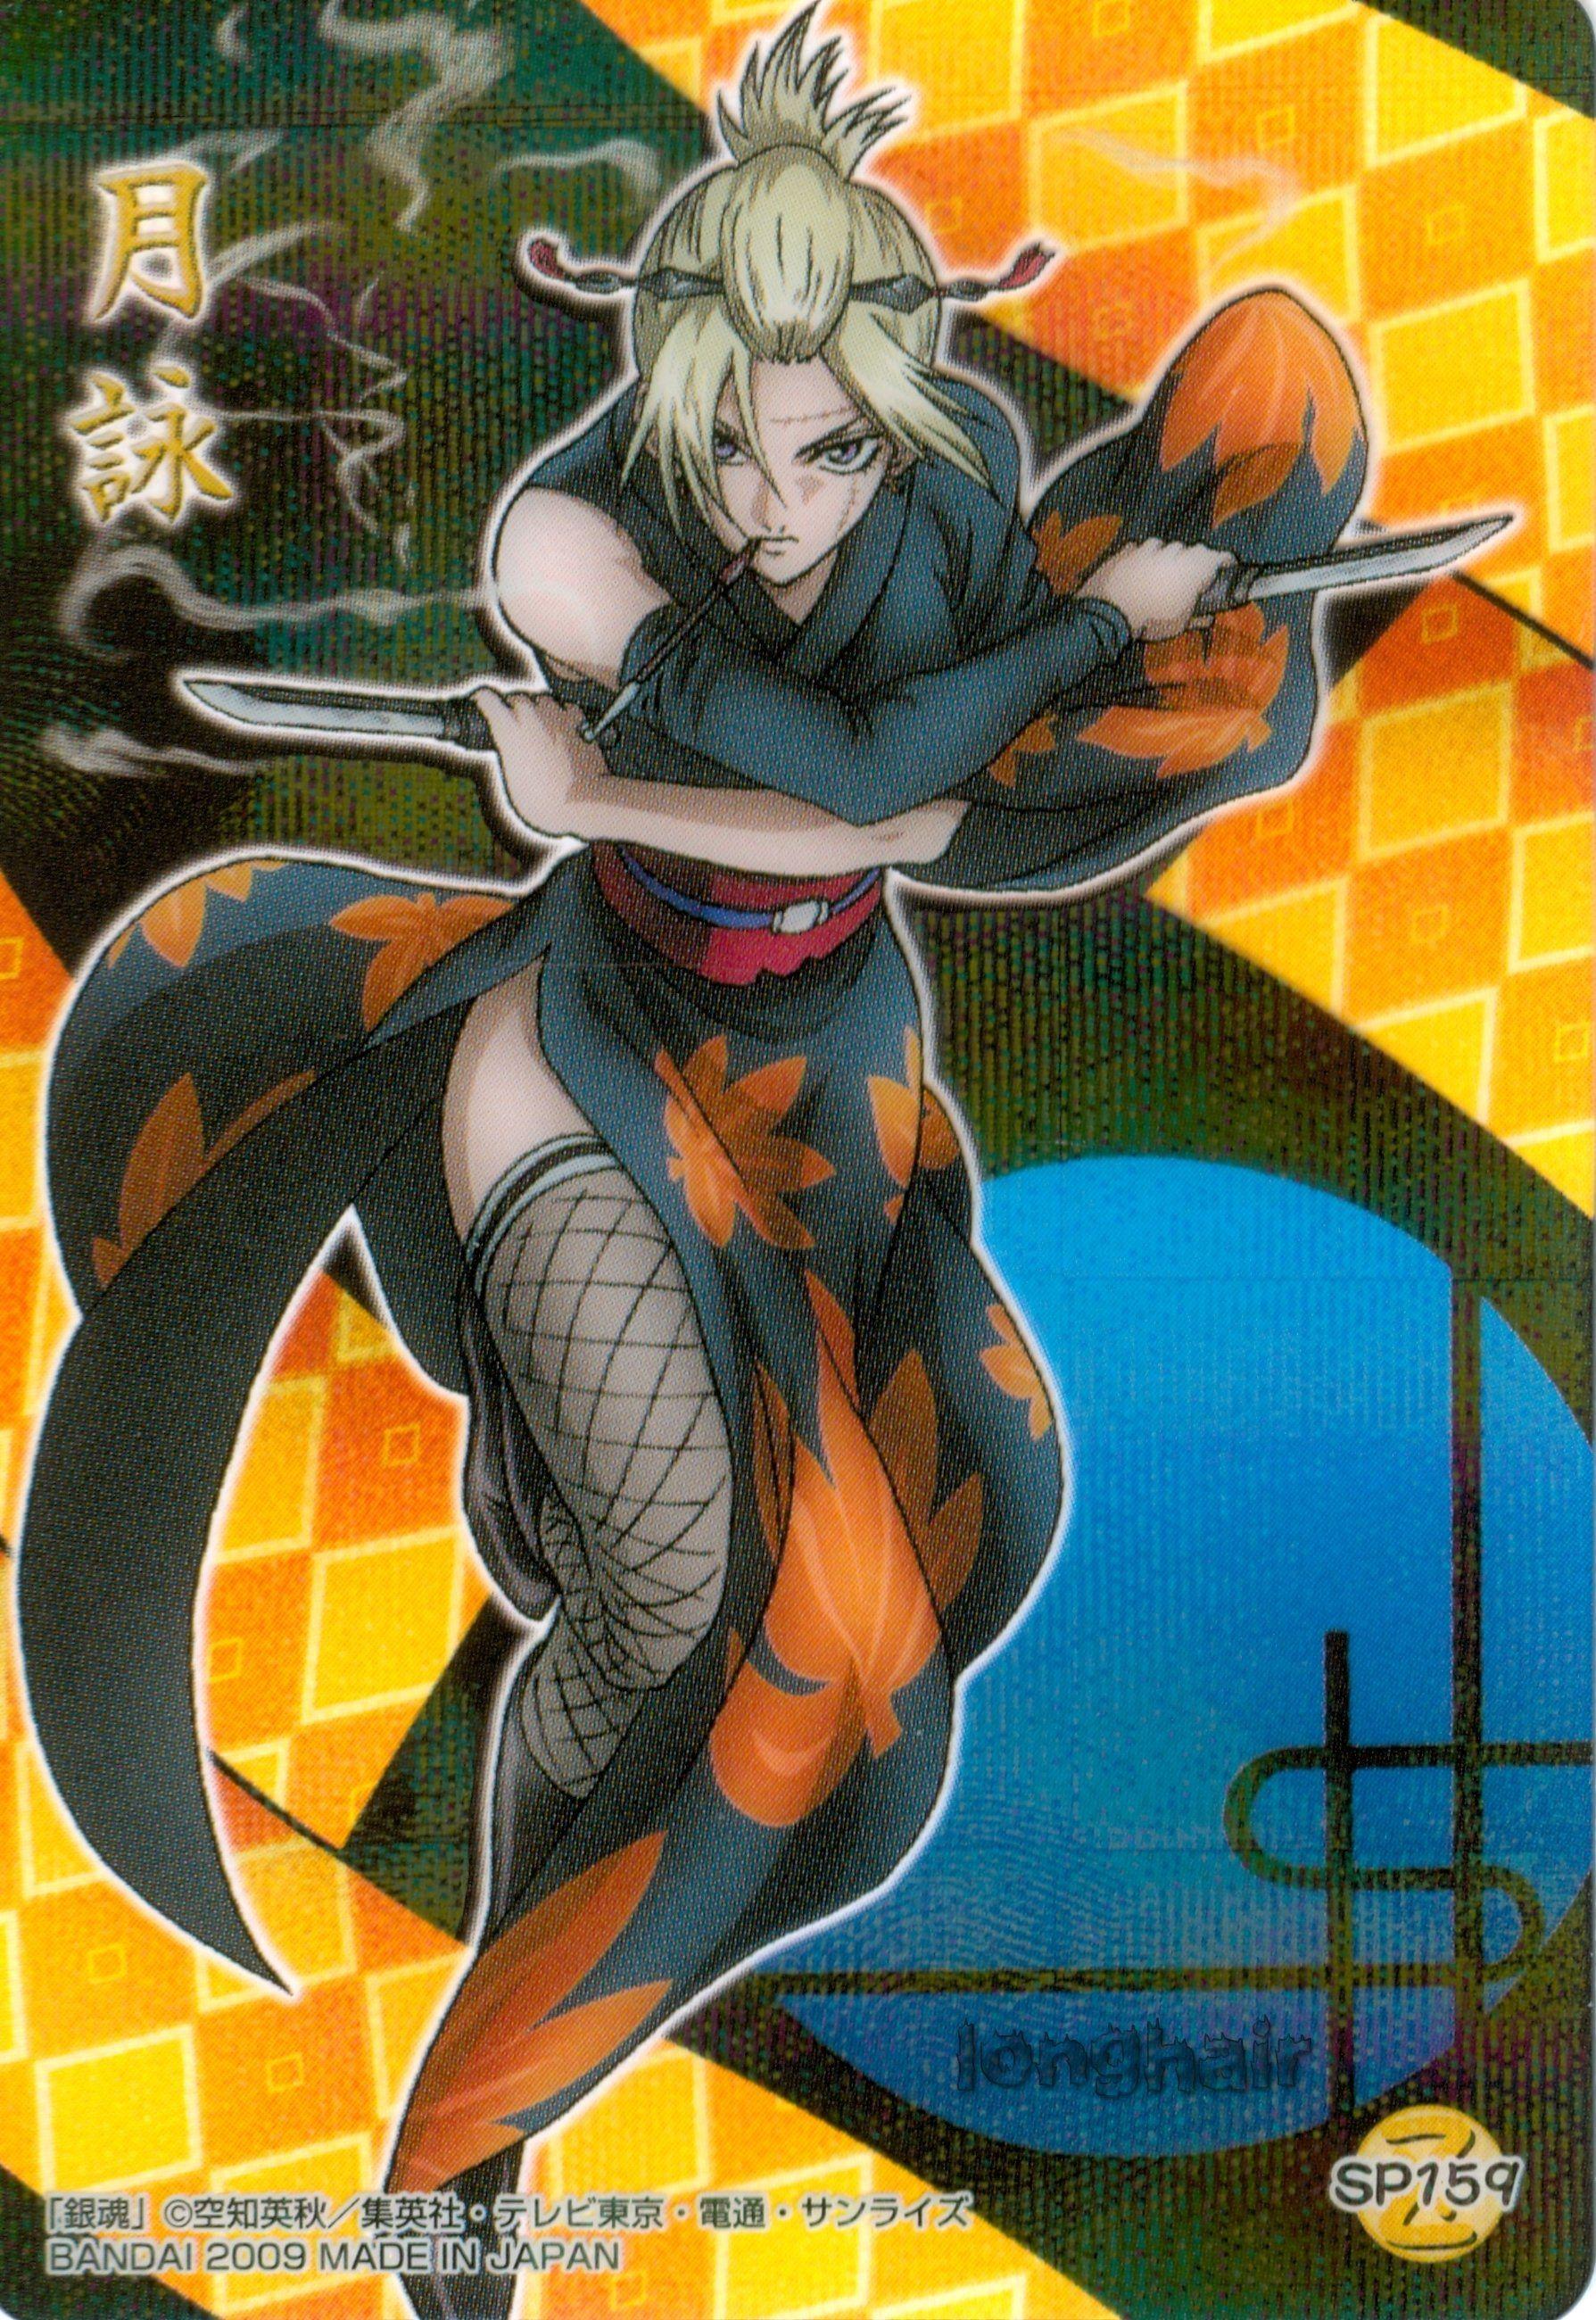 Gintama gintama tsukuyo fight anime manga anime desenhos